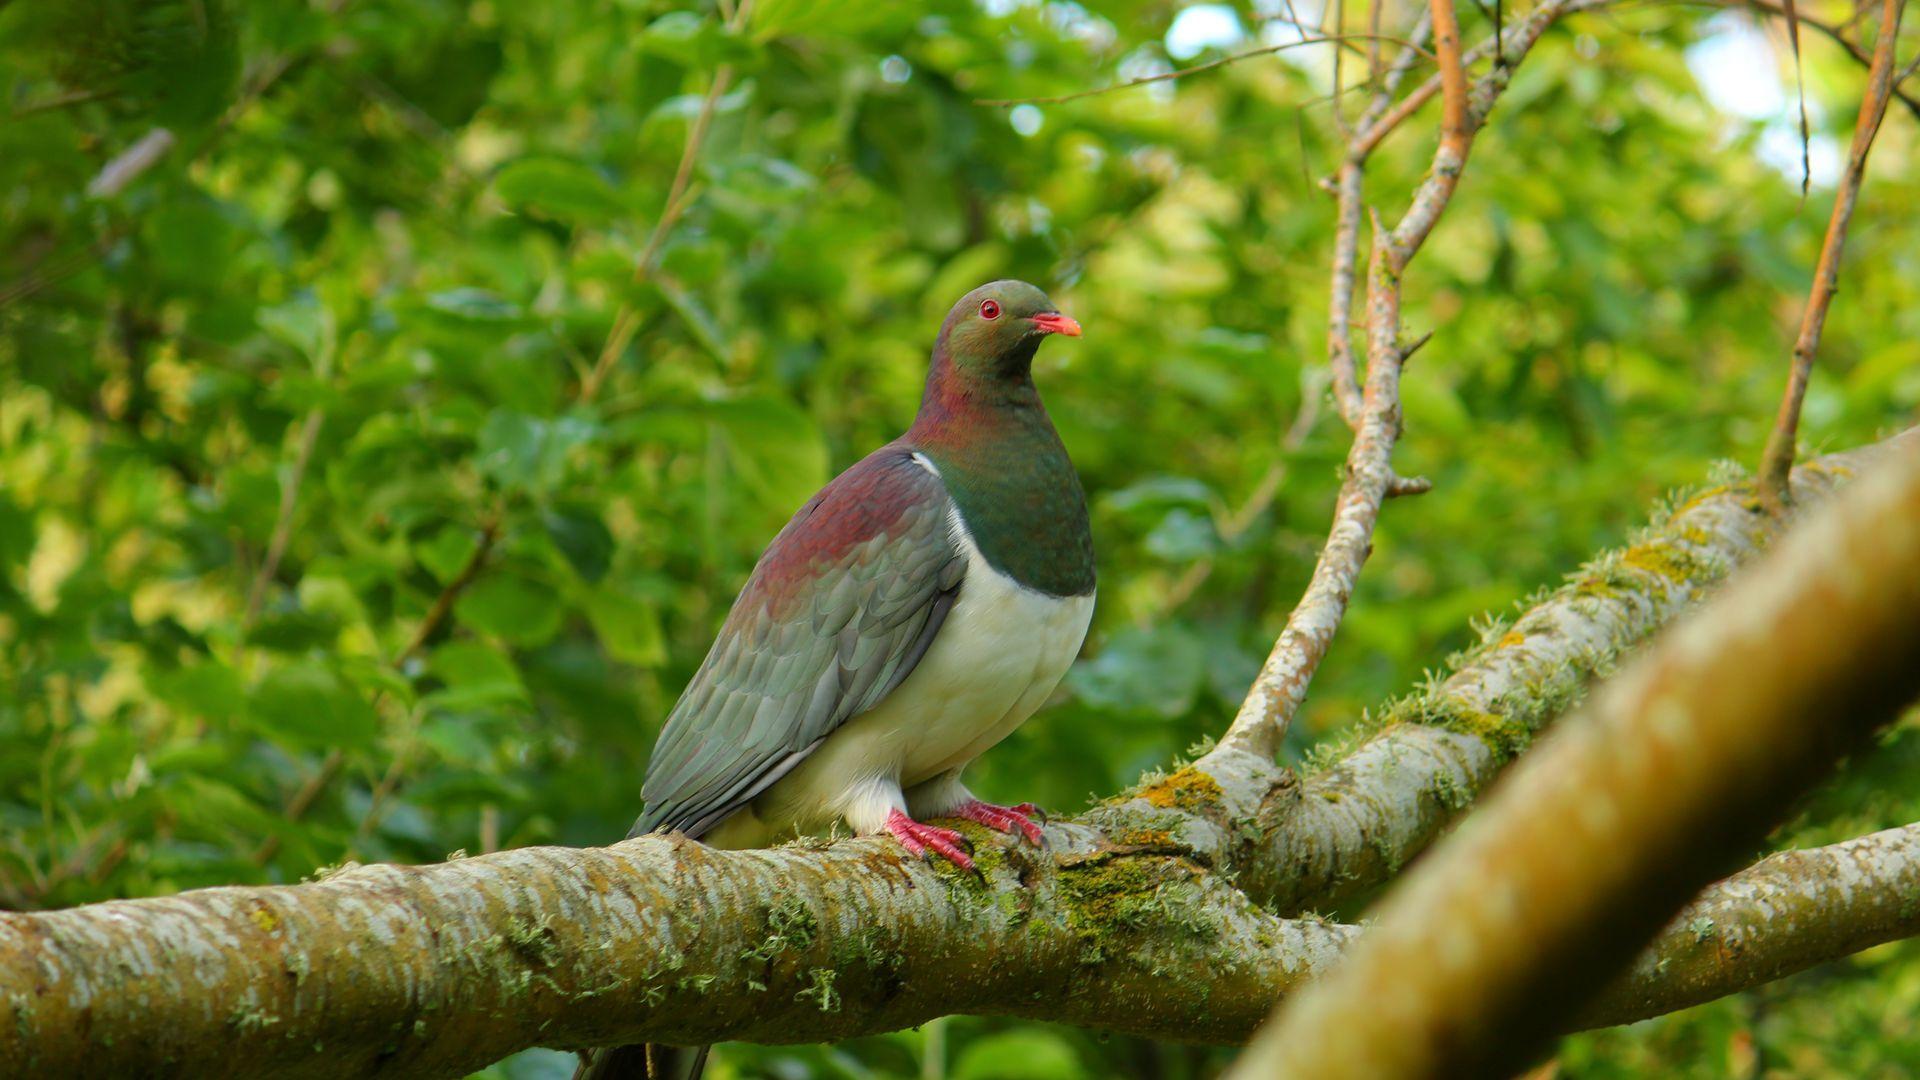 Kereru - native woodpigeon